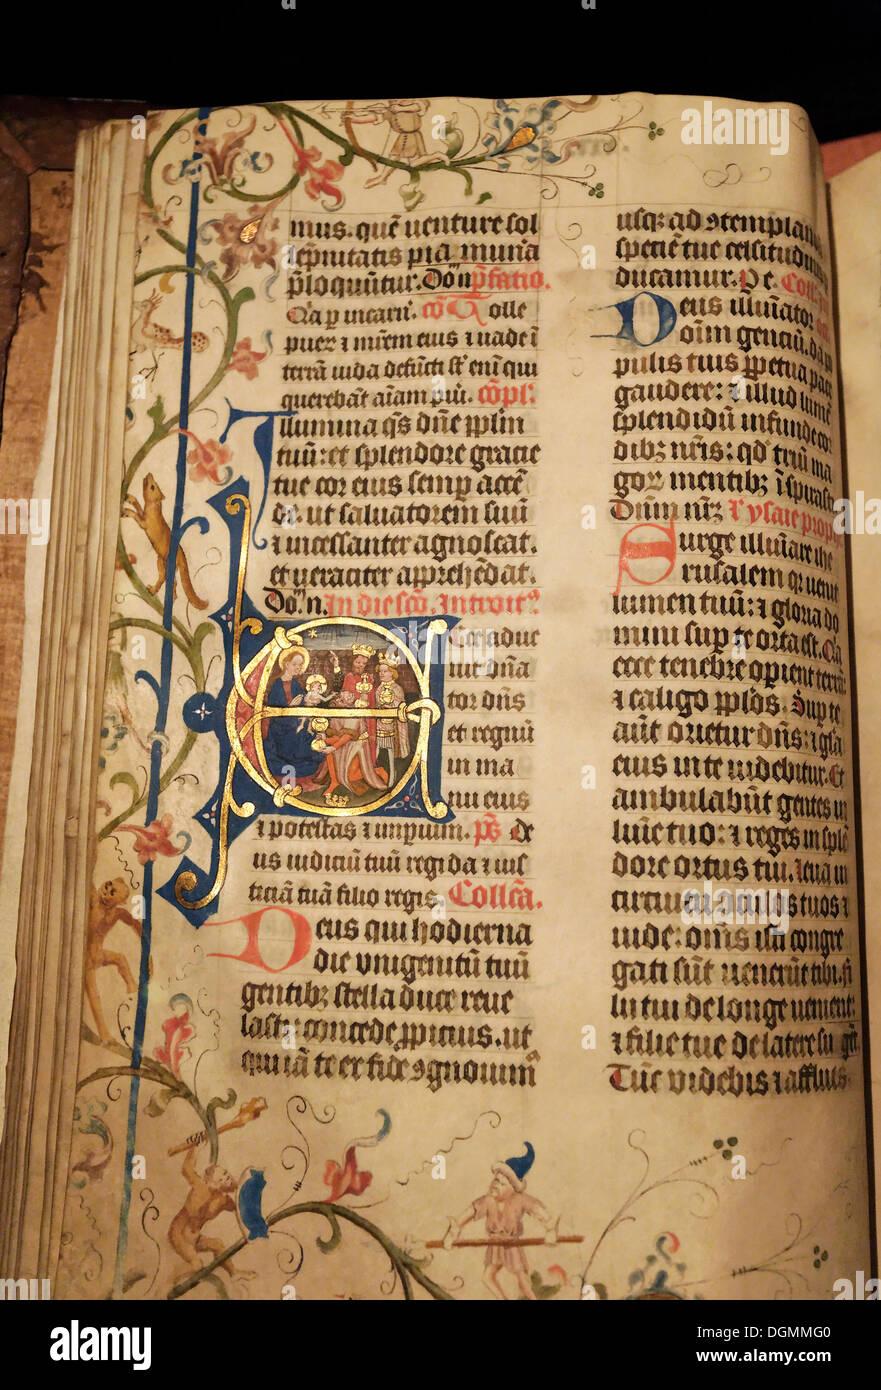 Missel manuscrit avec illuminations artistique initiale, avec les trois mages, illumination, Stiftsmuseum monastère Musée Xanten Photo Stock